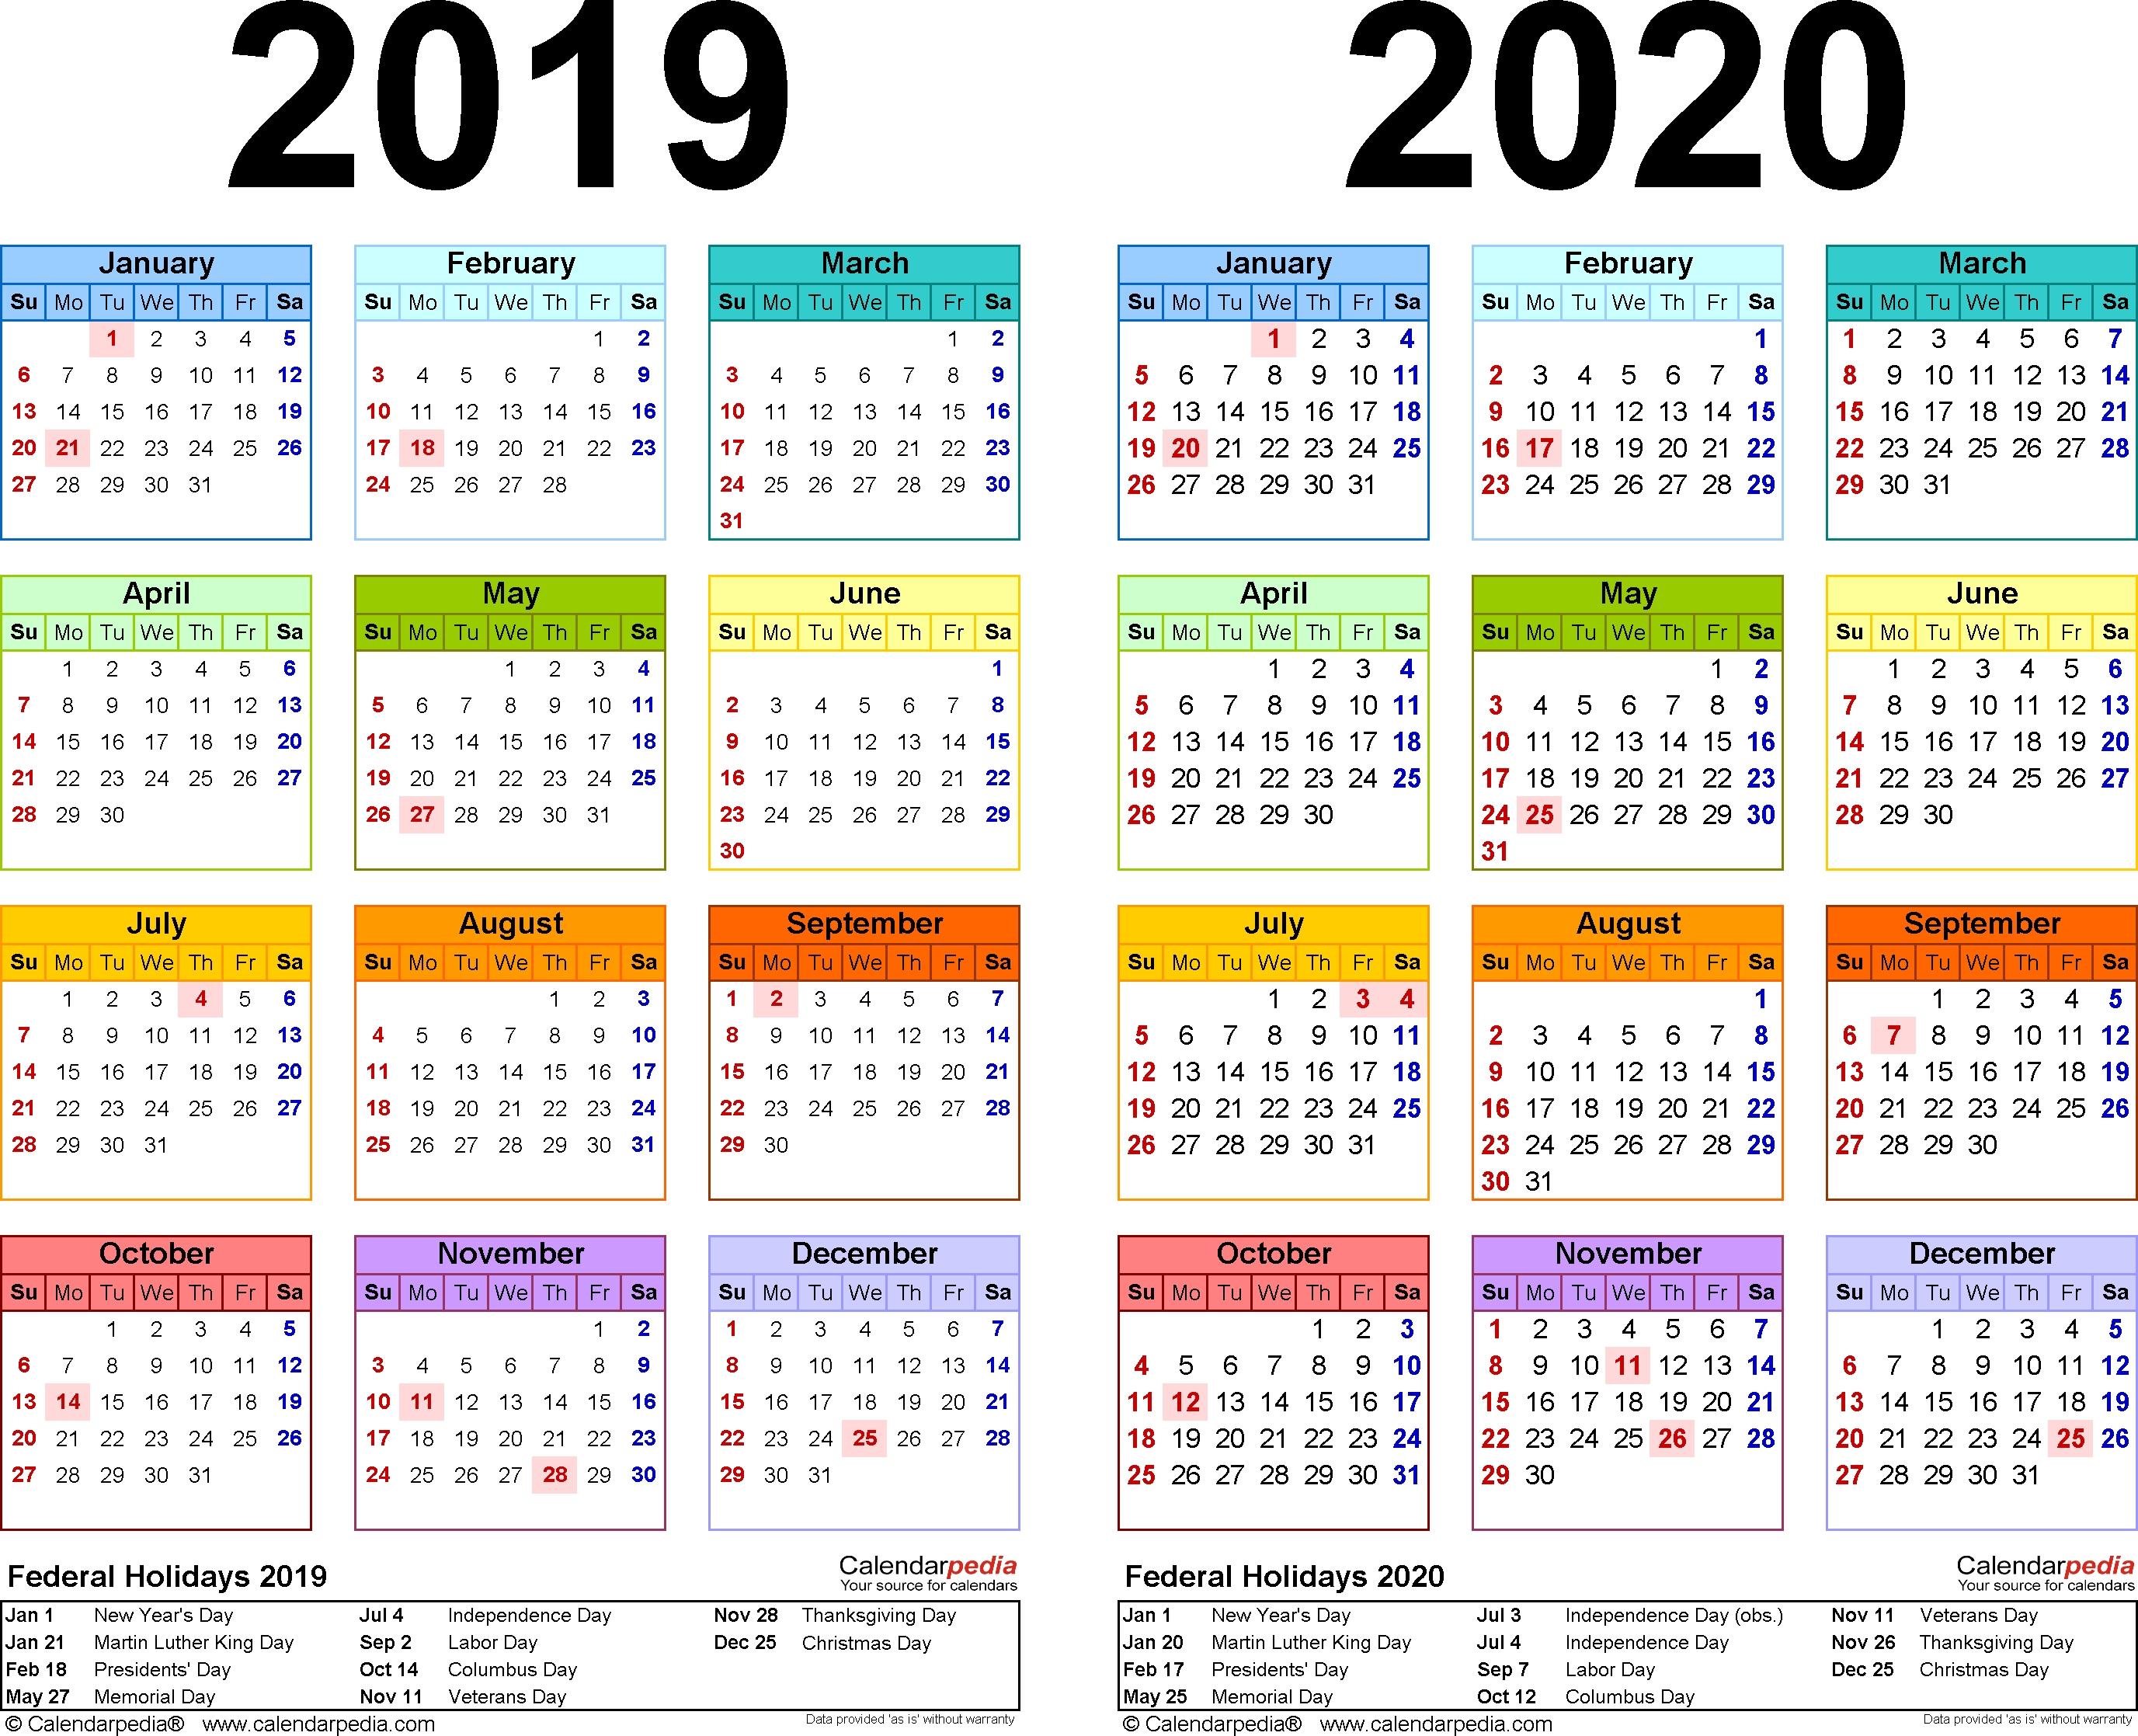 2019-2020 Calendar - Free Printable Two-Year Pdf Calendars in Calendar 2020 Large Box